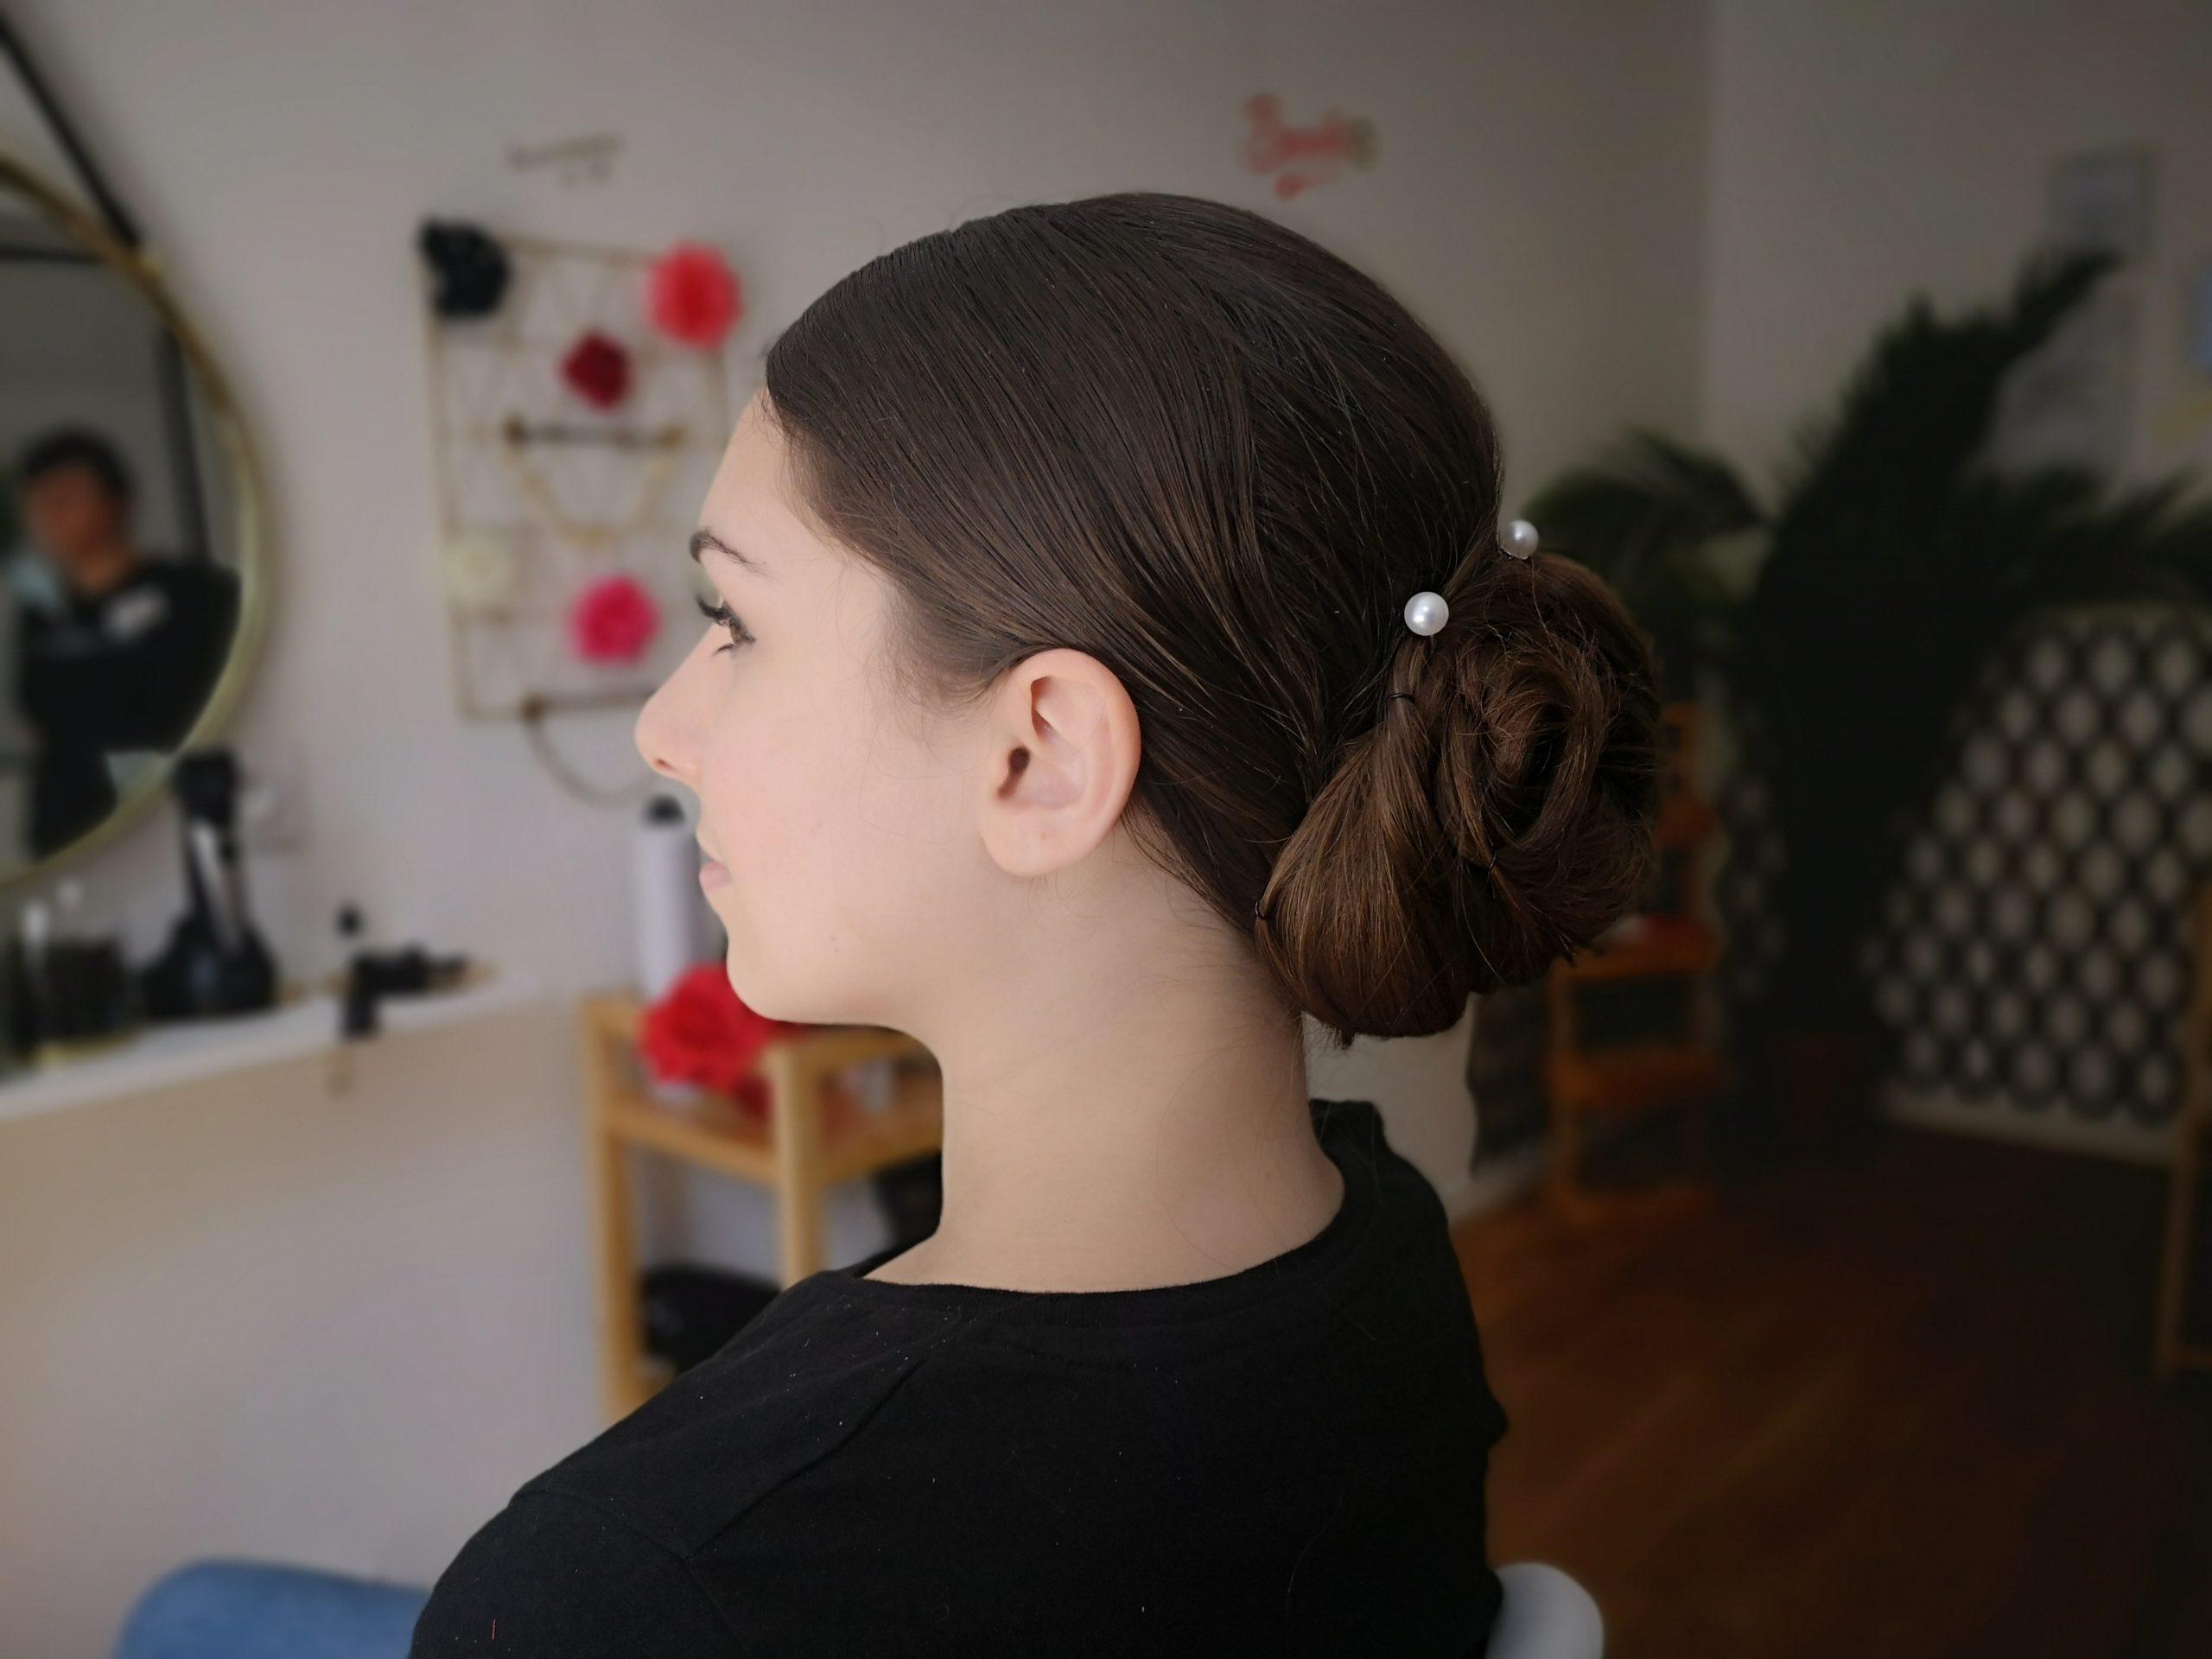 salon-coiffure-beautypopup-boulogne-billancourt-chignon